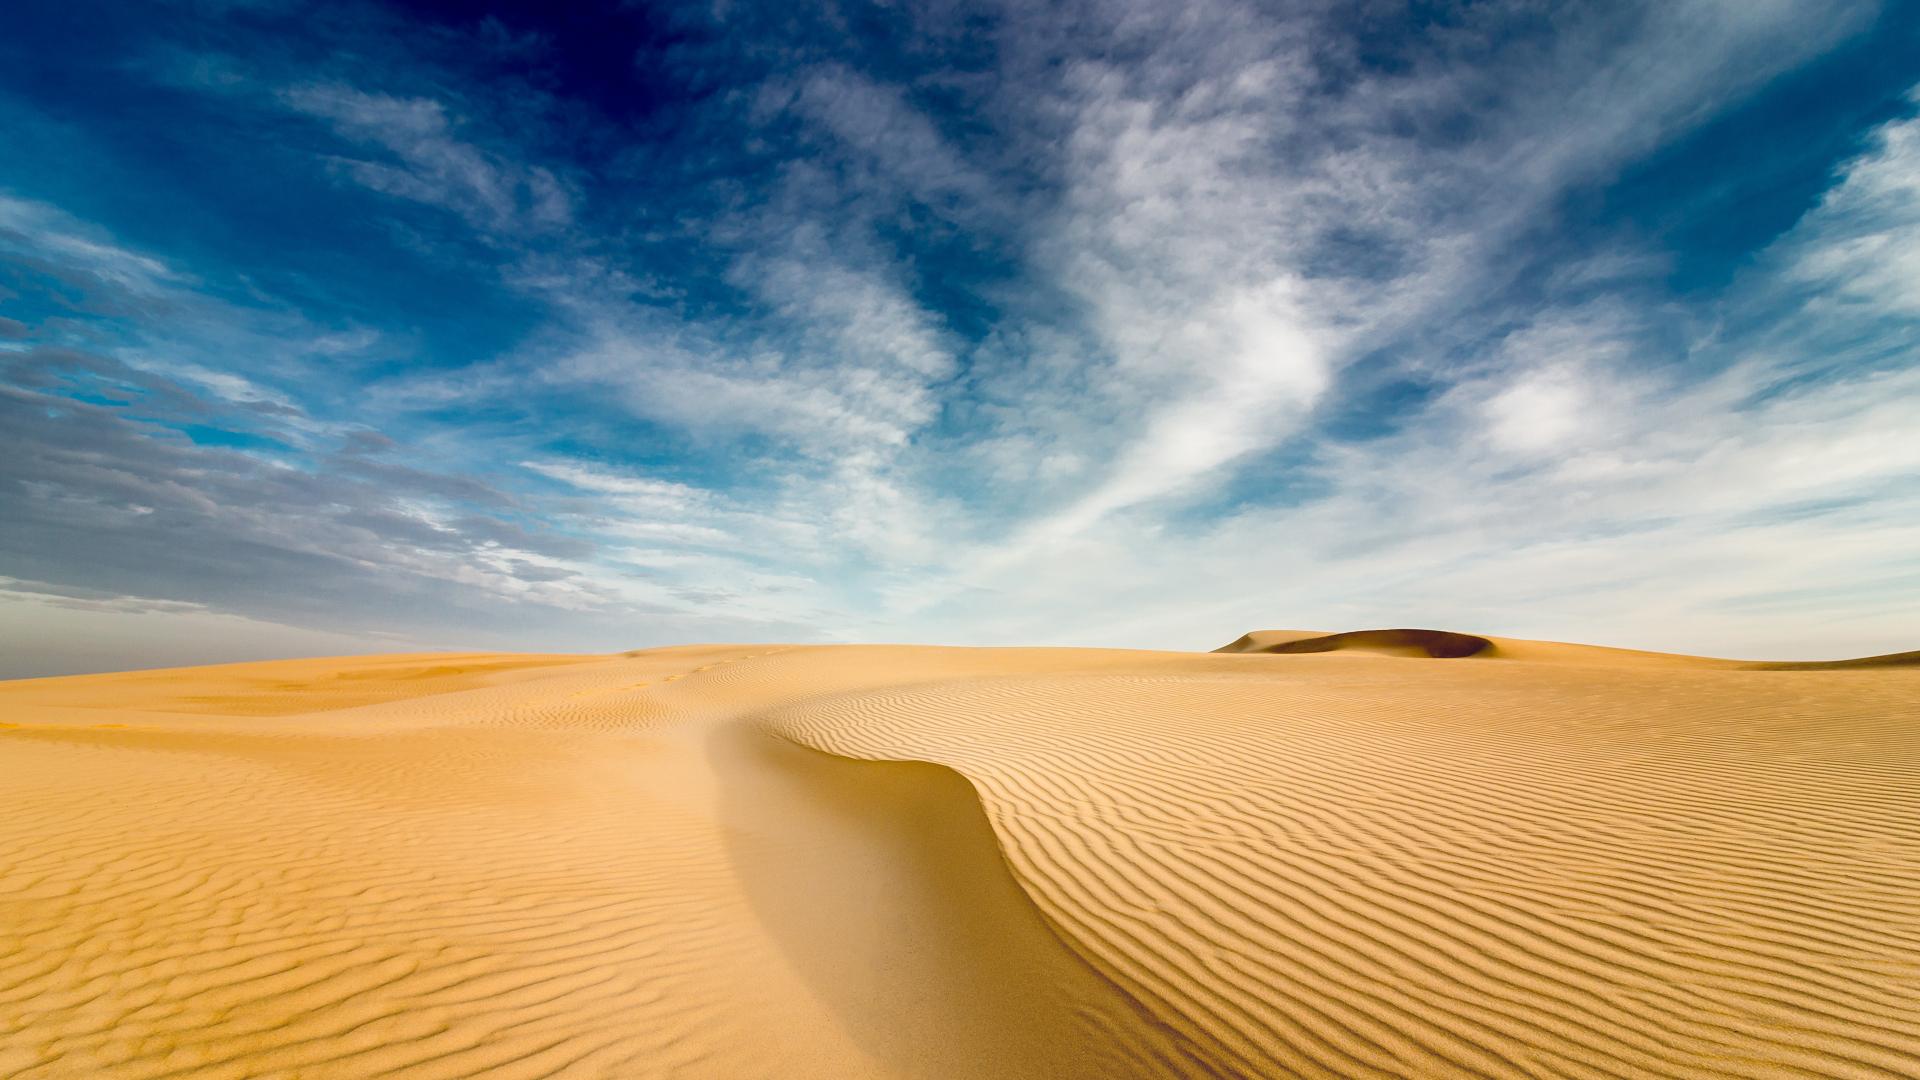 Download 1920x1080 wallpaper desert sand, dunes, landscape ...